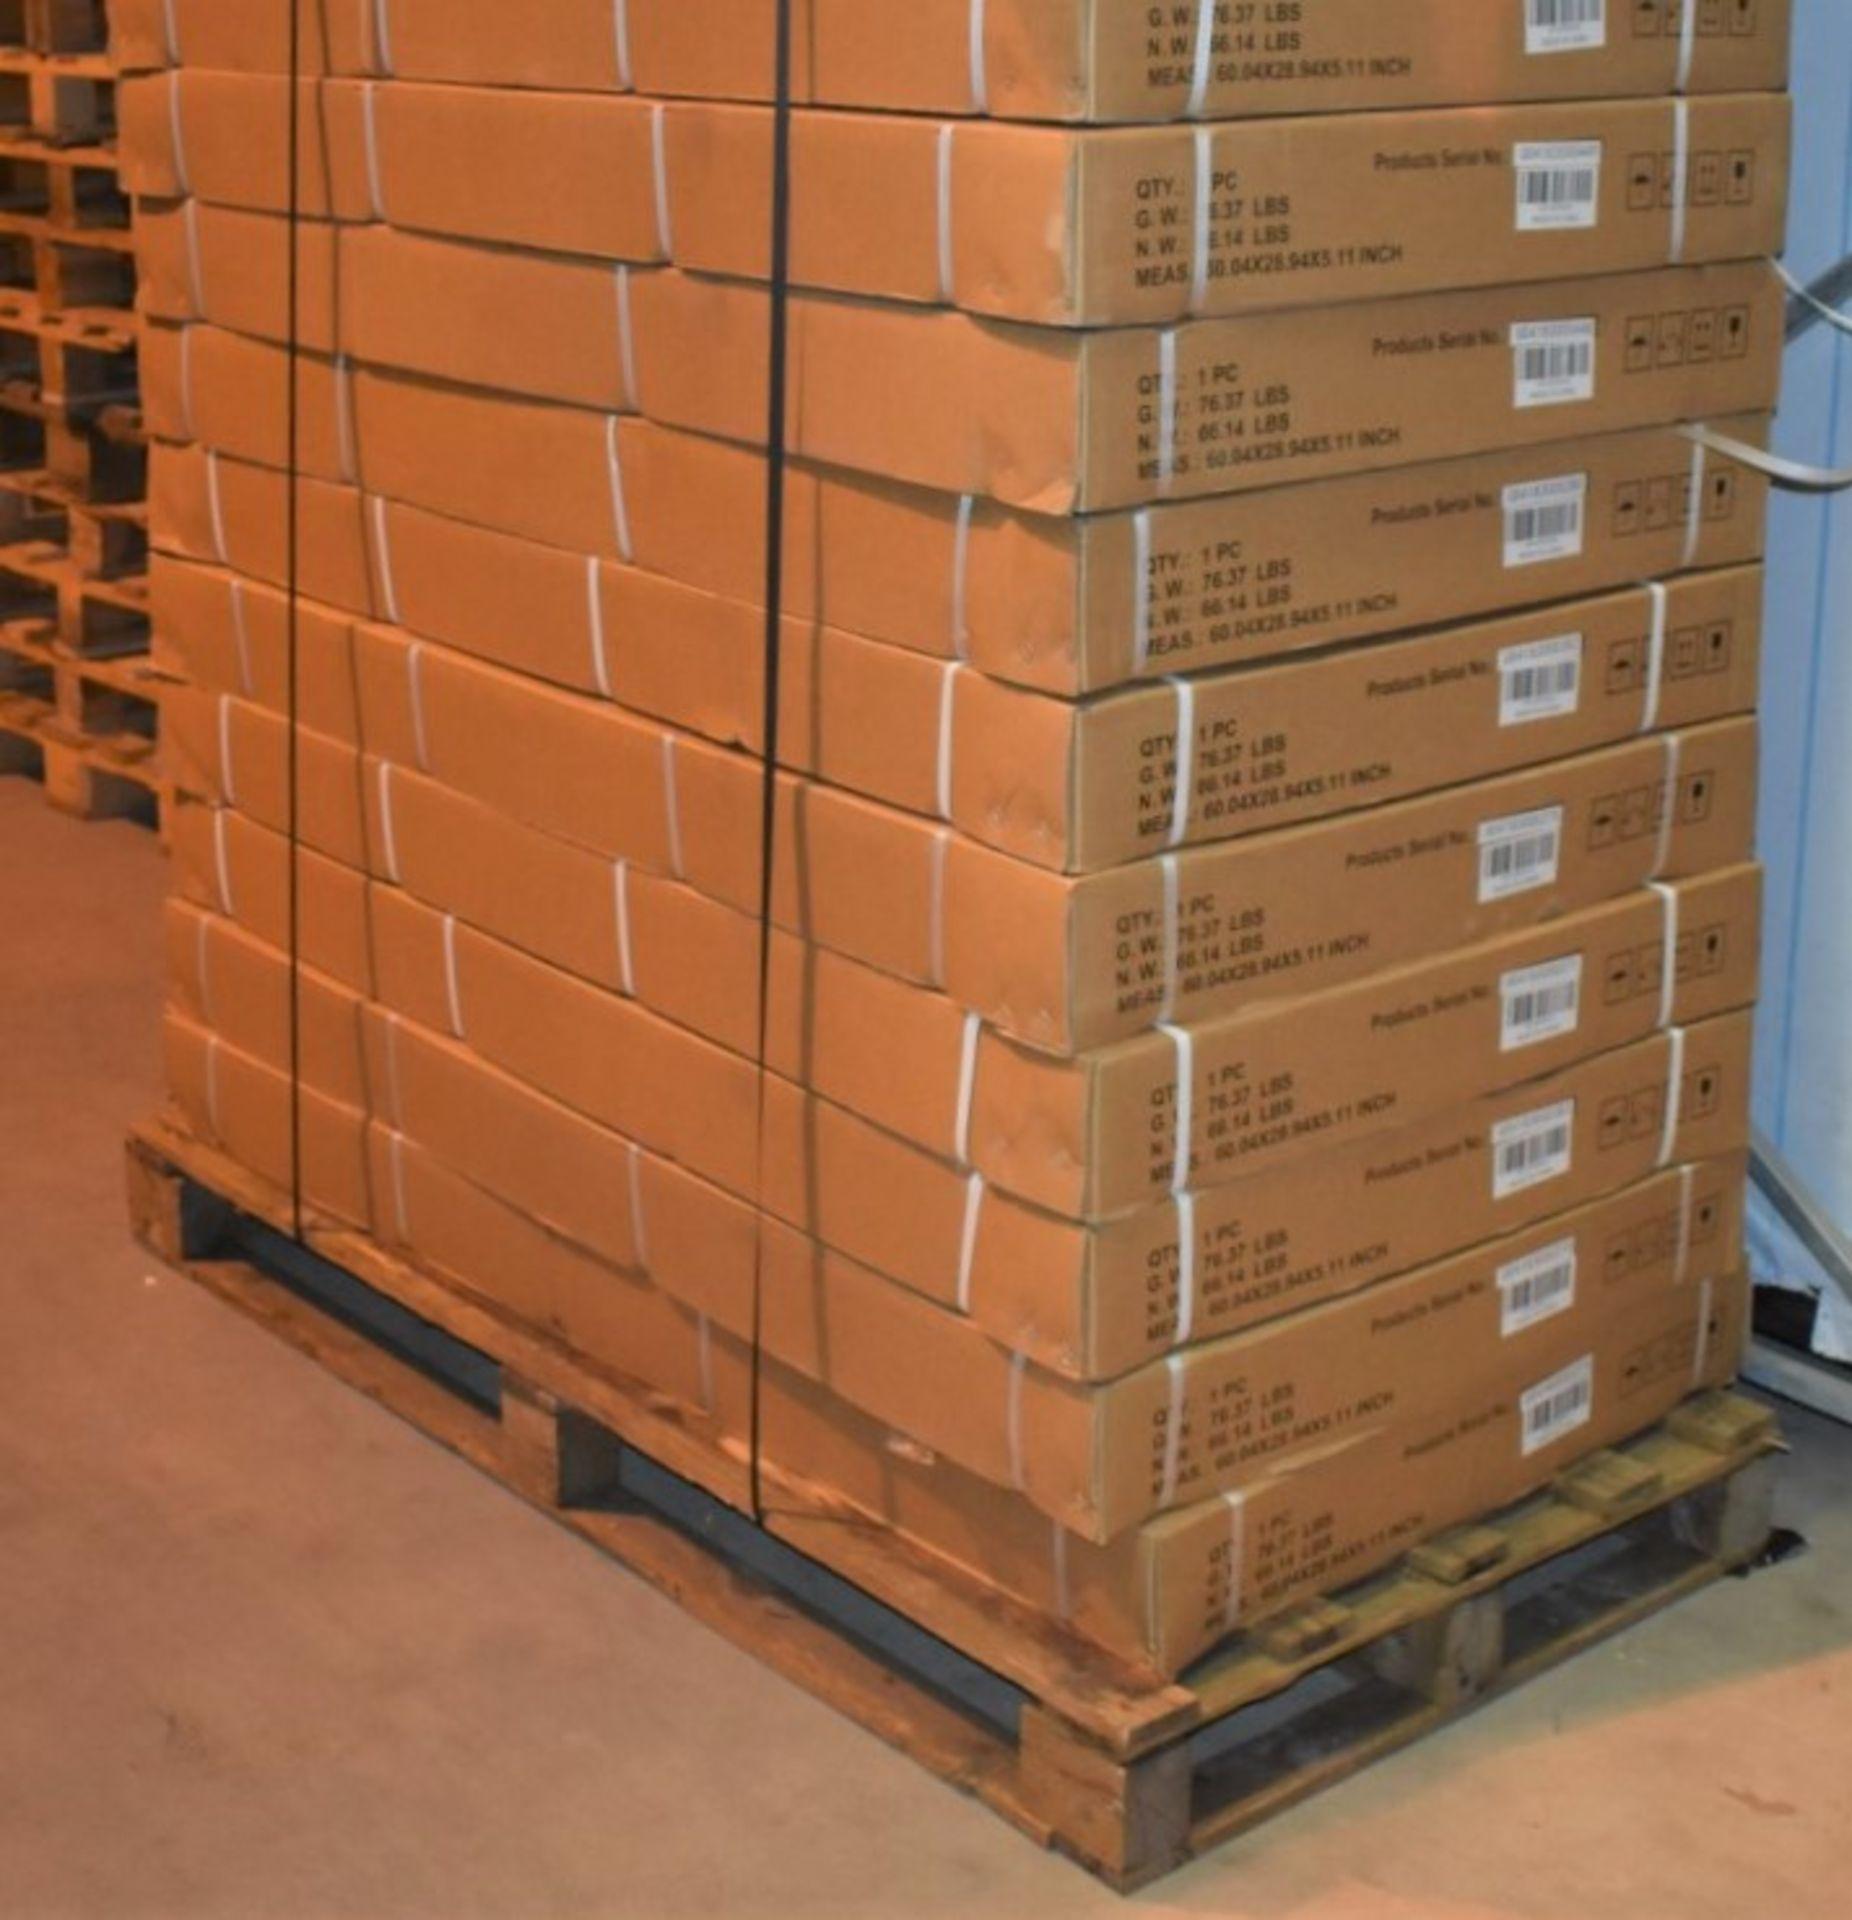 10 x Slim Tread Ultra Thin Smart Treadmill Running Machine - Brand New Sealed Stock - RRP £799 Each! - Image 6 of 24